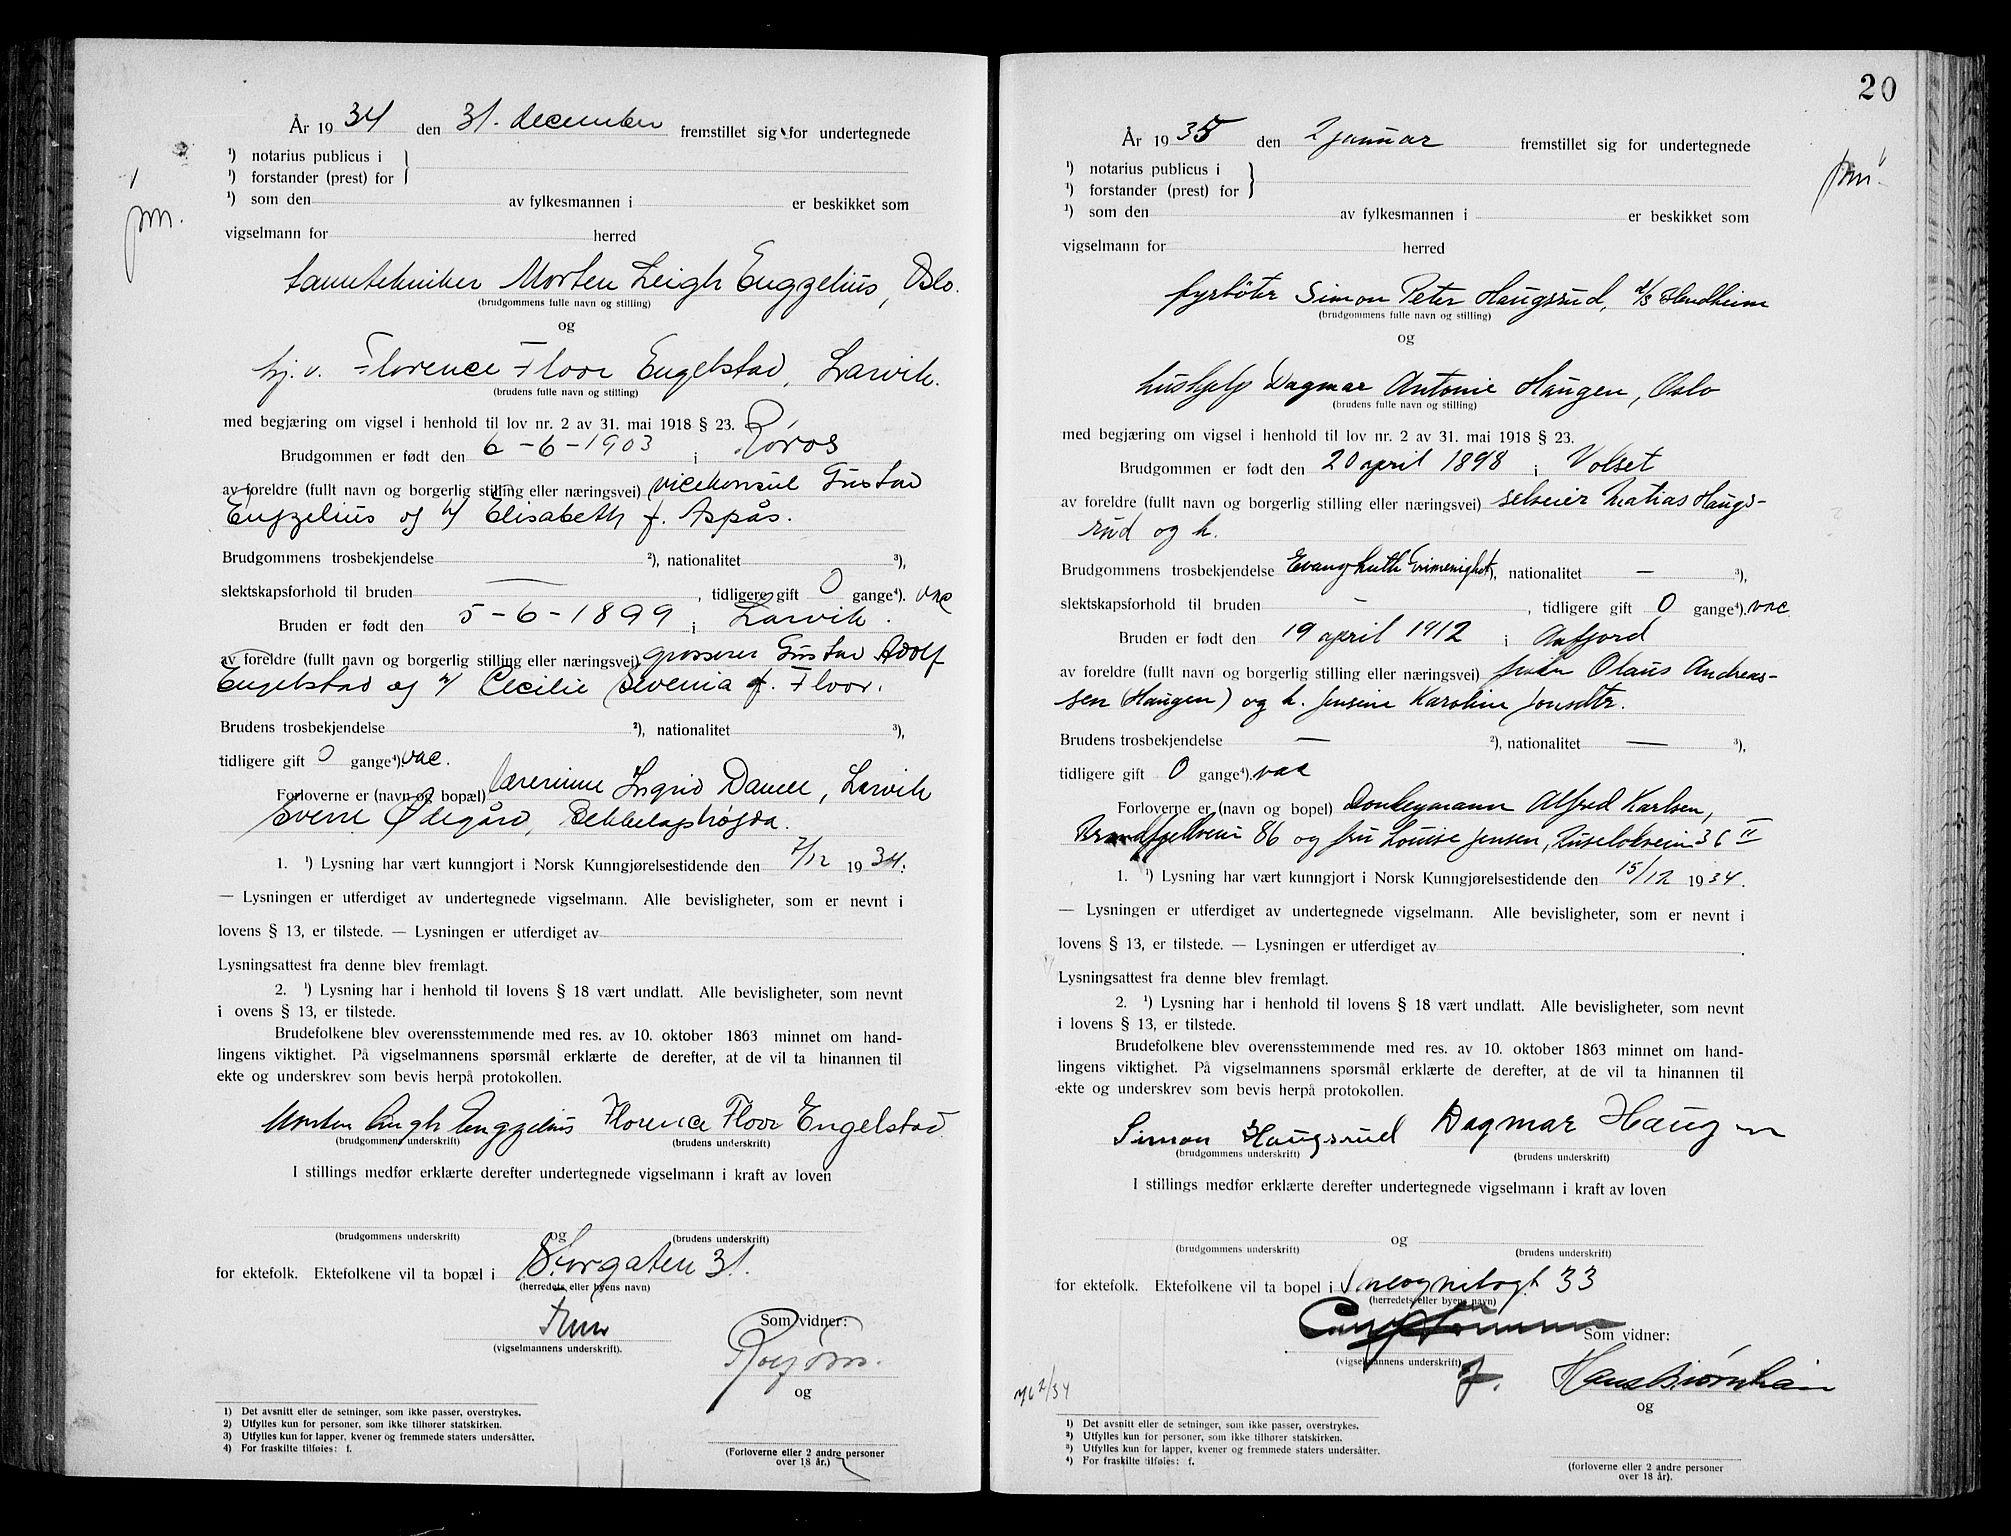 SAO, Oslo byfogd avd. I, L/Lb/Lbb/L0024: Notarialprotokoll, rekke II: Vigsler, 1934-1935, s. 19b-20a